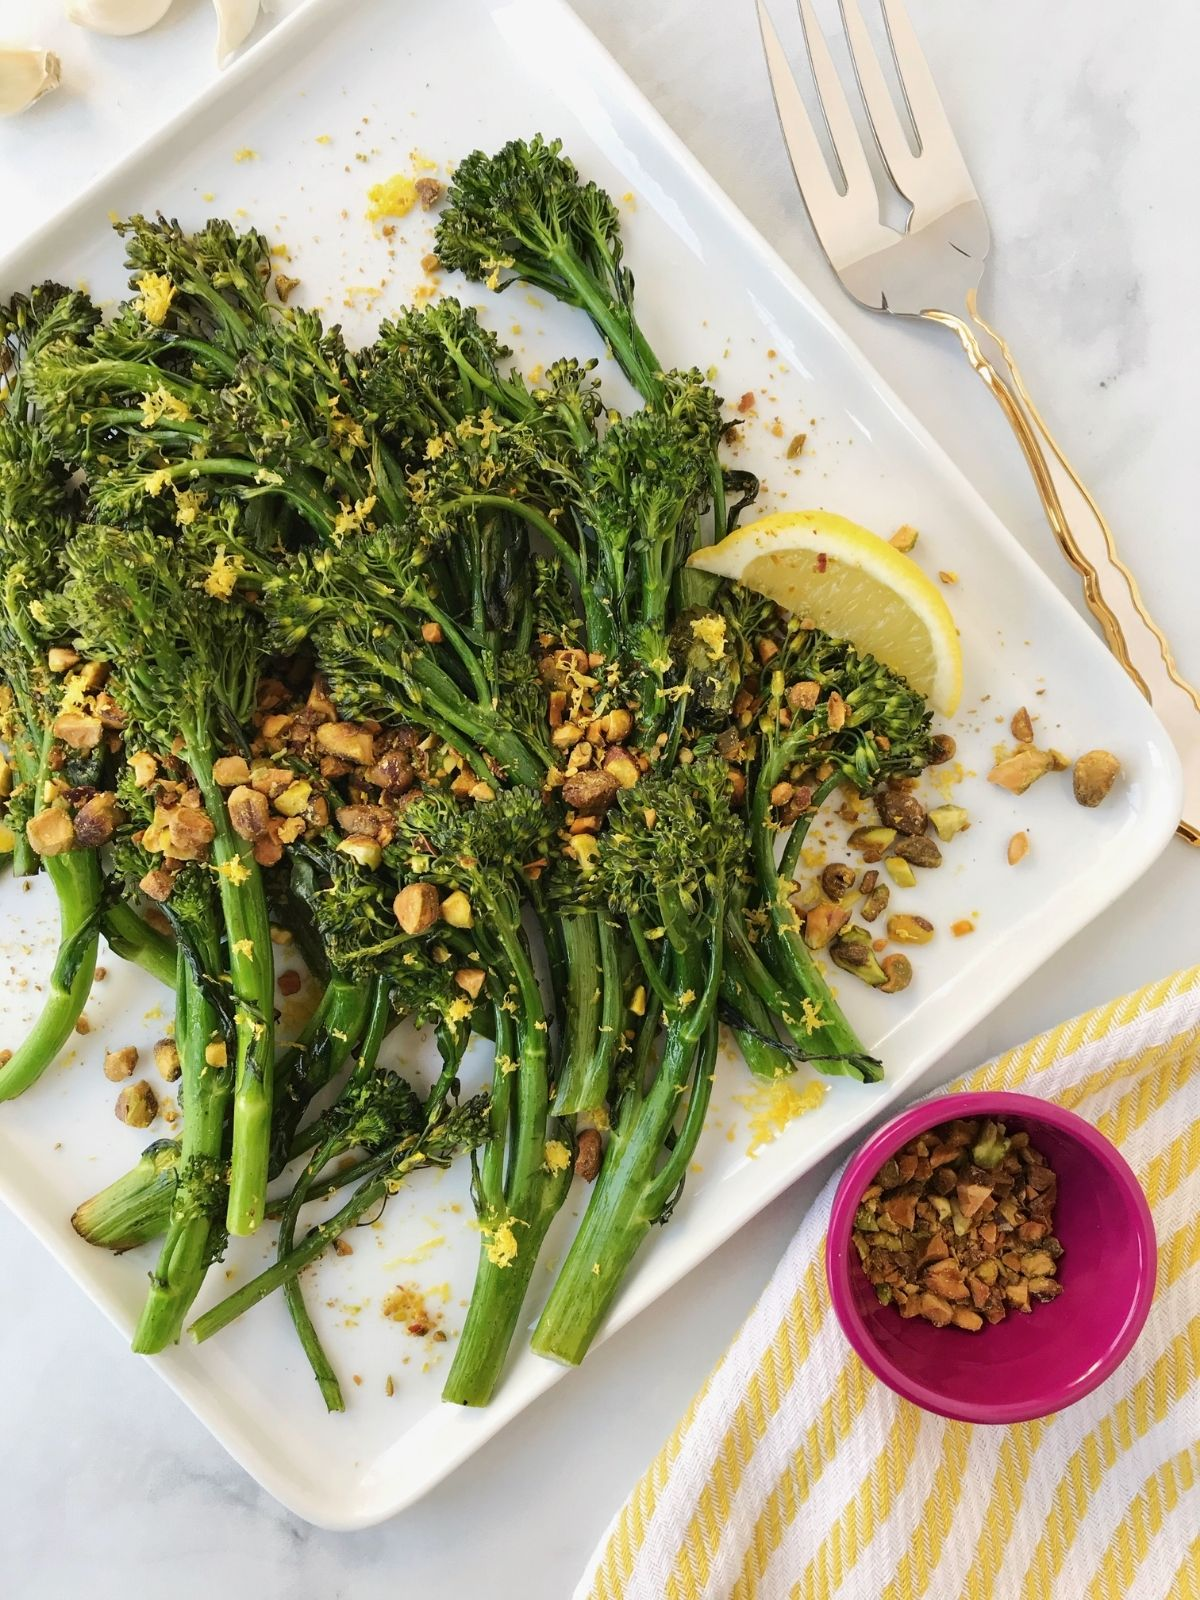 fork alongside a plate of broccolini